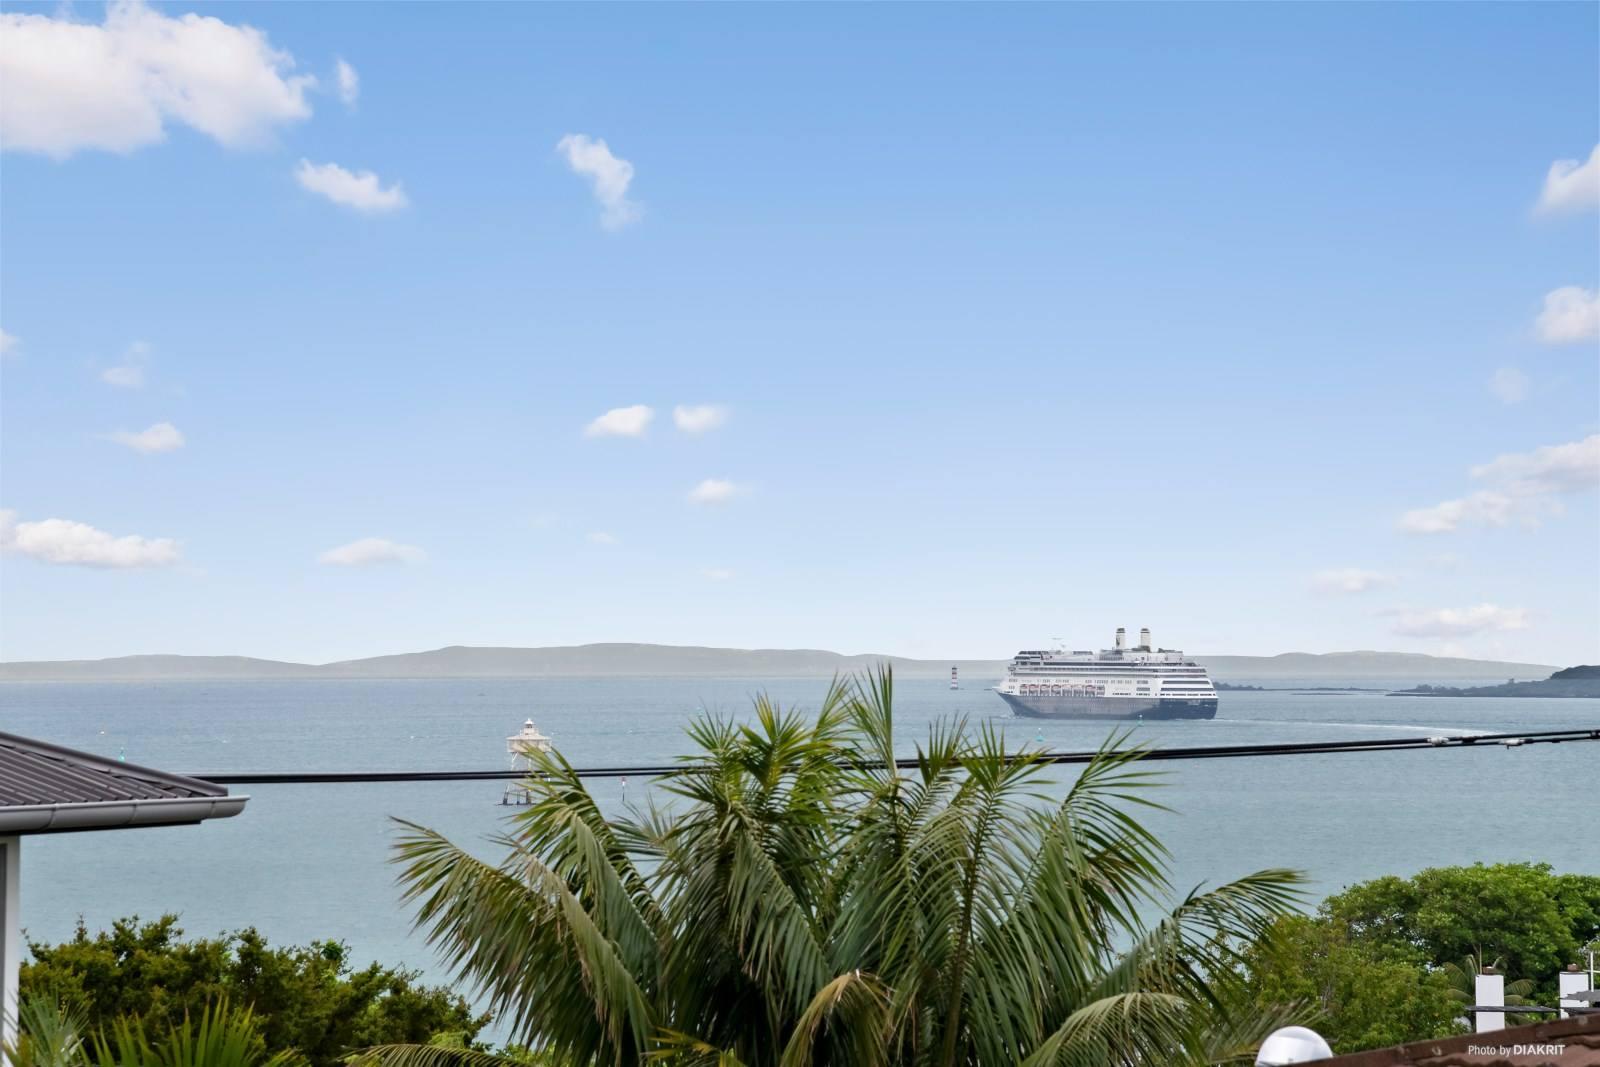 Mission Bay 4房 现代海景房 名师之作 精心布局 奢享惬意滨海生活 Mission Bay Luxury Living with Seaviews